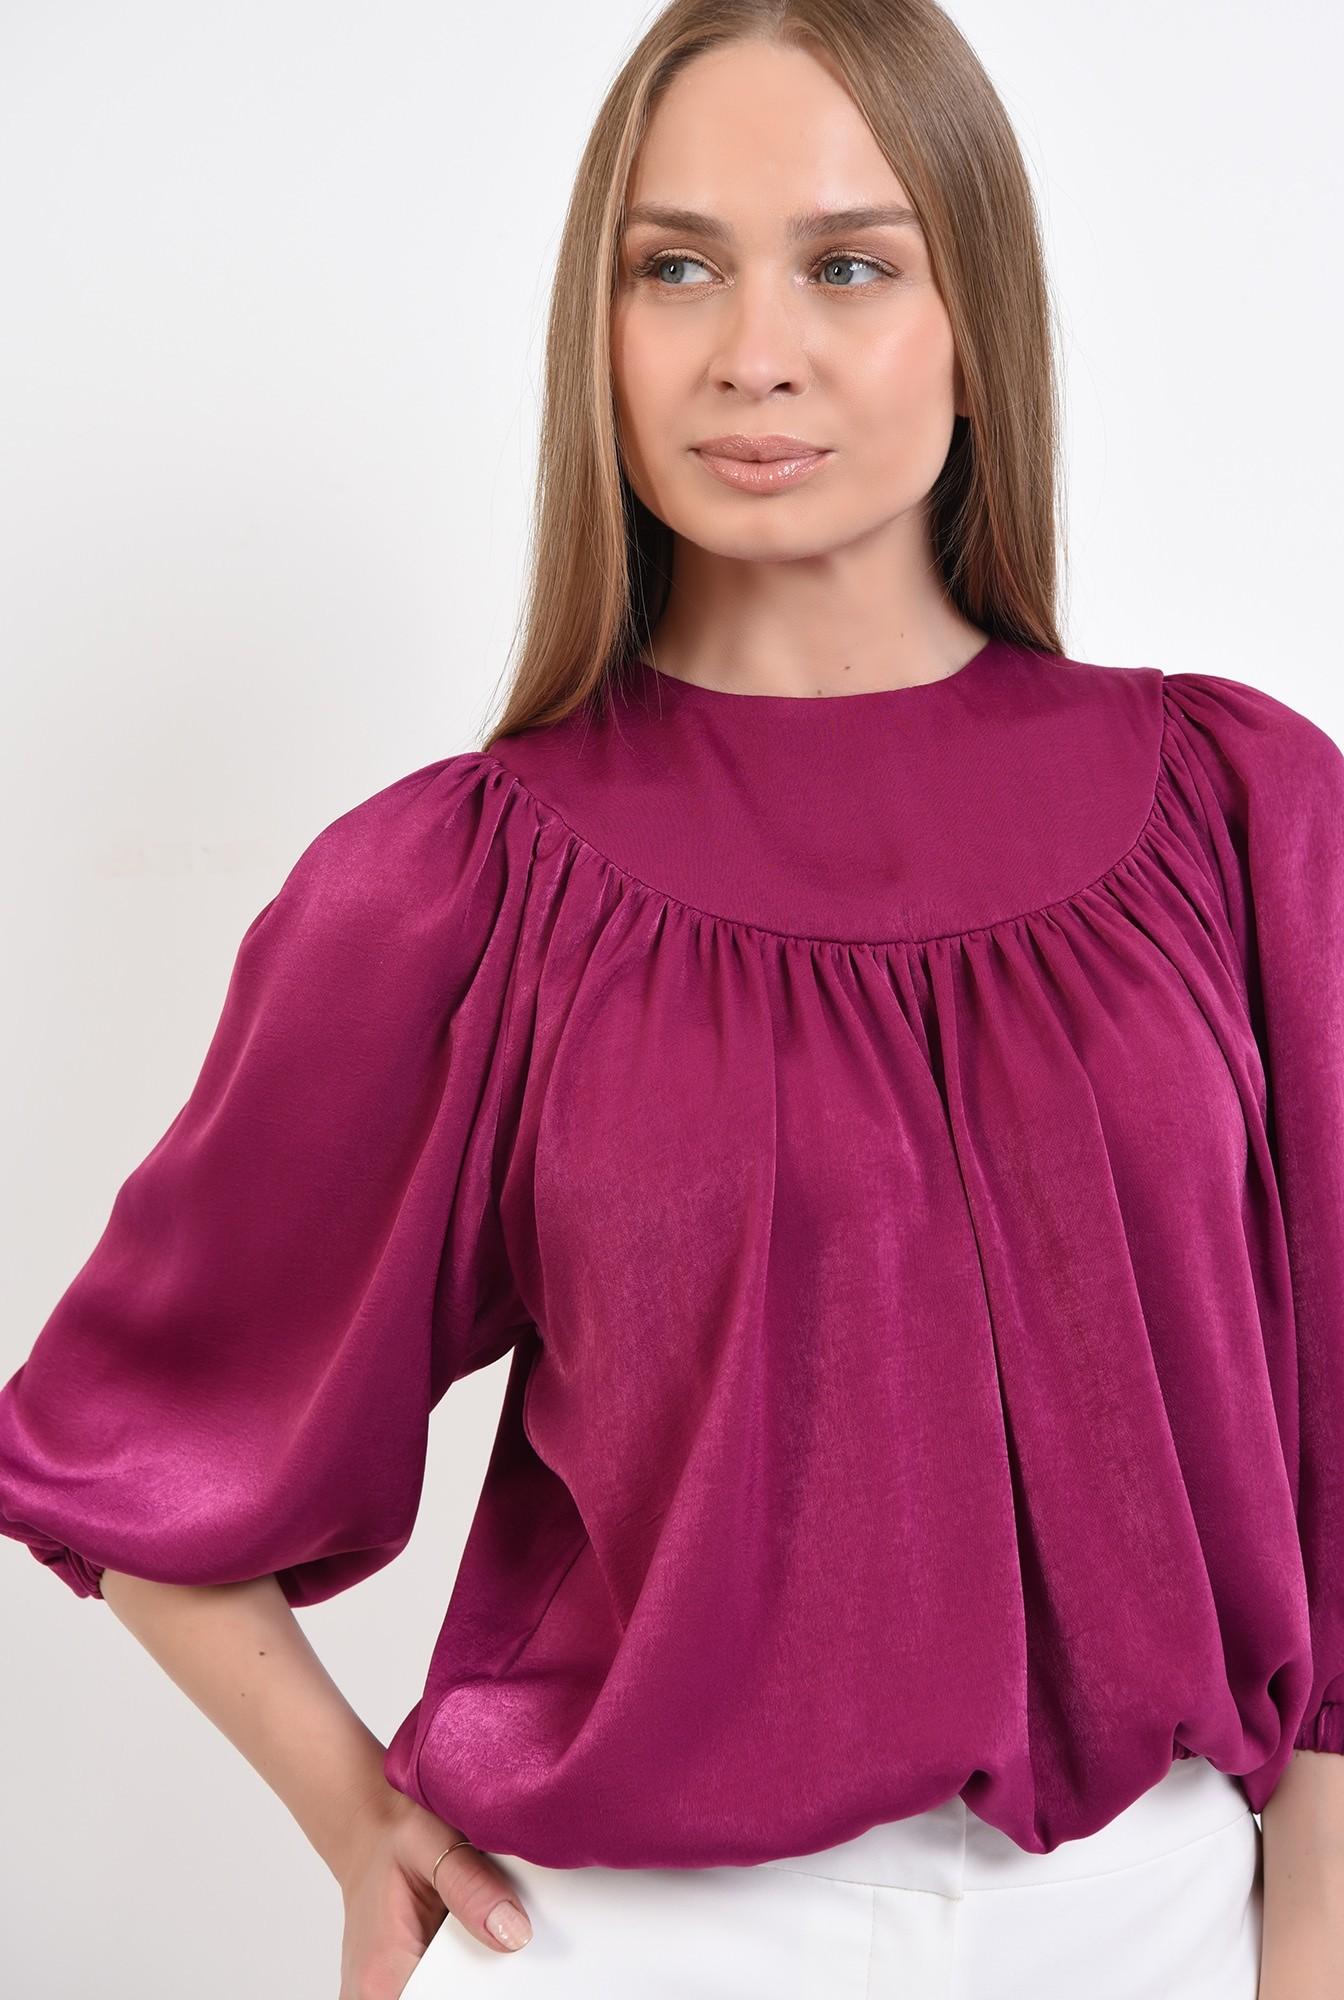 2 - 360 - bluza eleganta, din satin, cu platca, maneci bufante